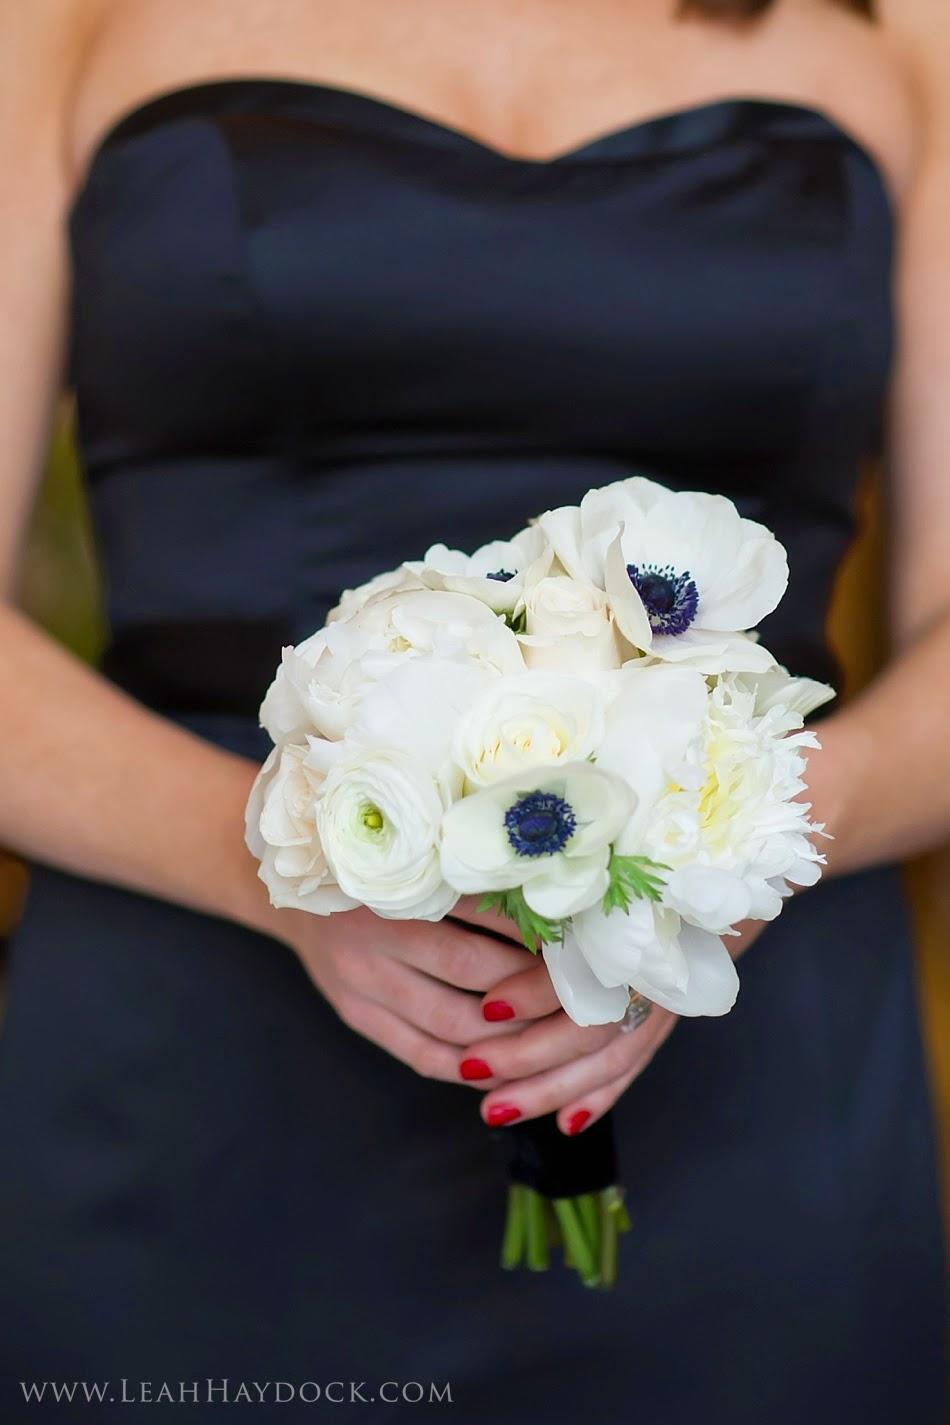 les fleurs : leah haydock photography : boston harbor hotel : winter wedding : white peony & black center anemone